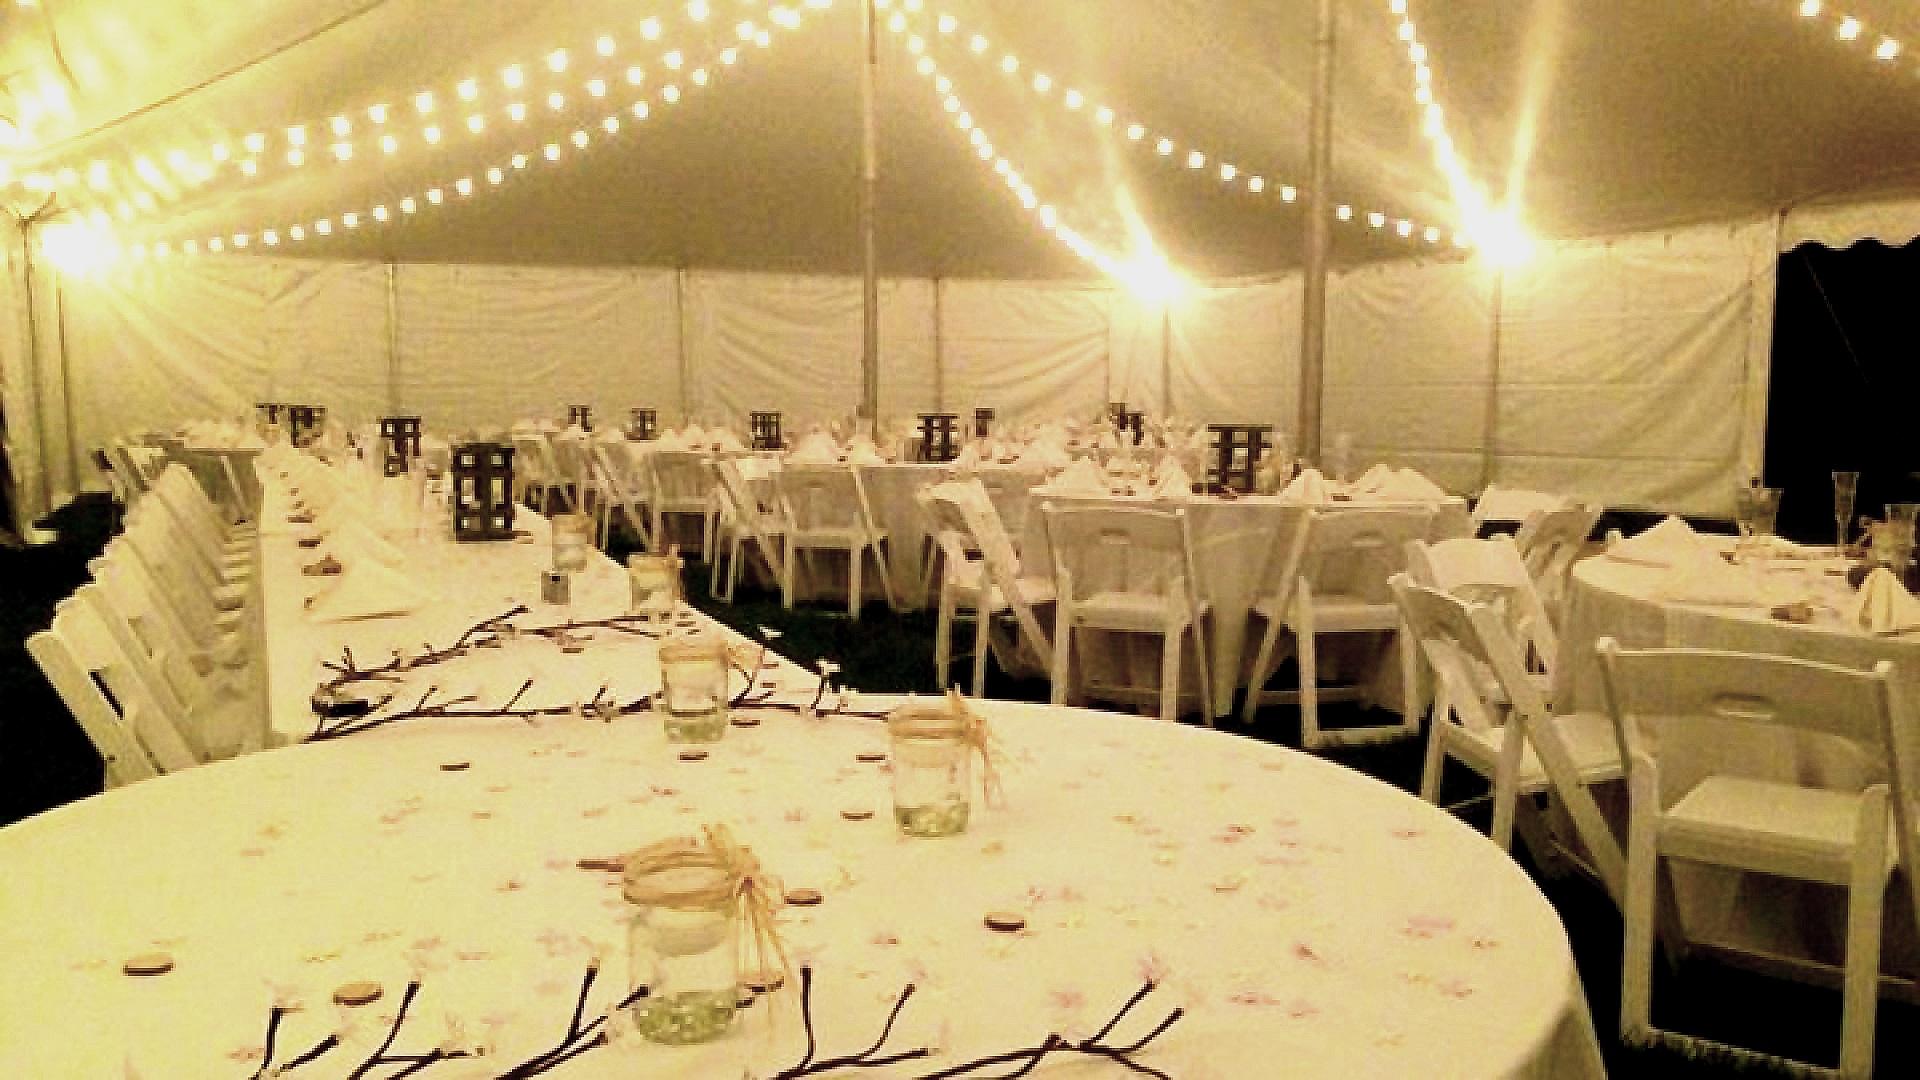 Nazareth-Pennsylvania-Cafe-Lights-Tents-For-Rent-683.jpg